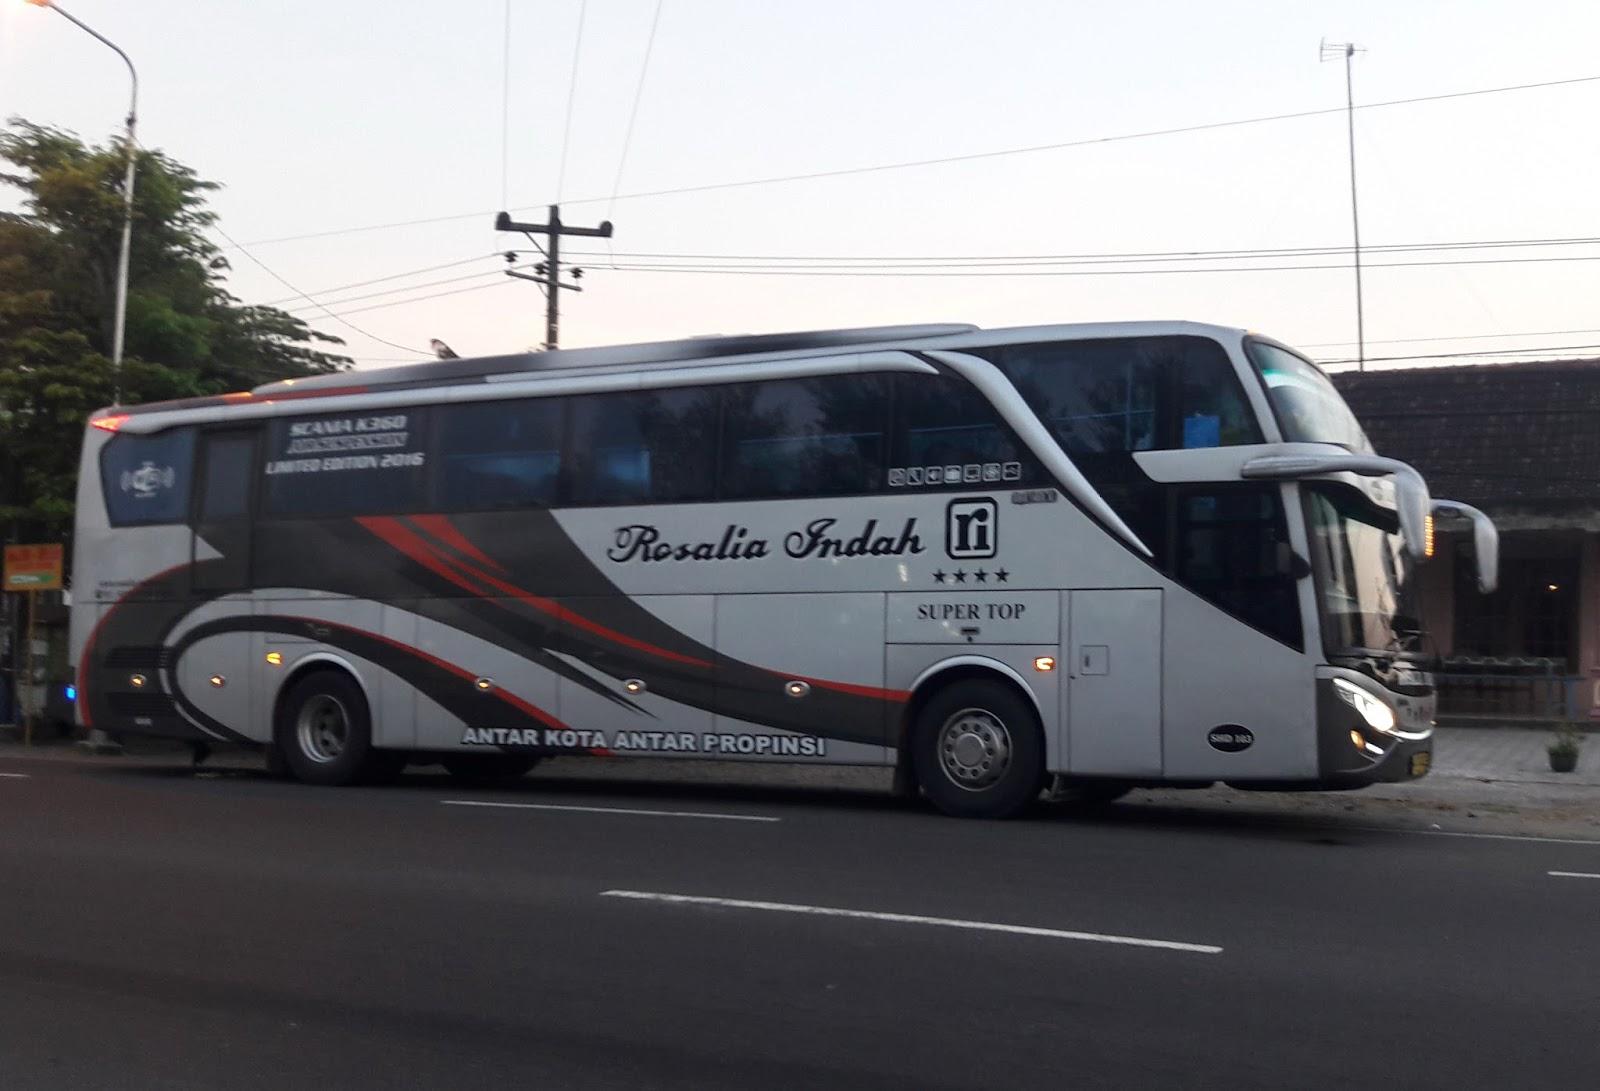 Catatan Perjalanan Rosalia Indah Super Top Shd Bitung Madiun